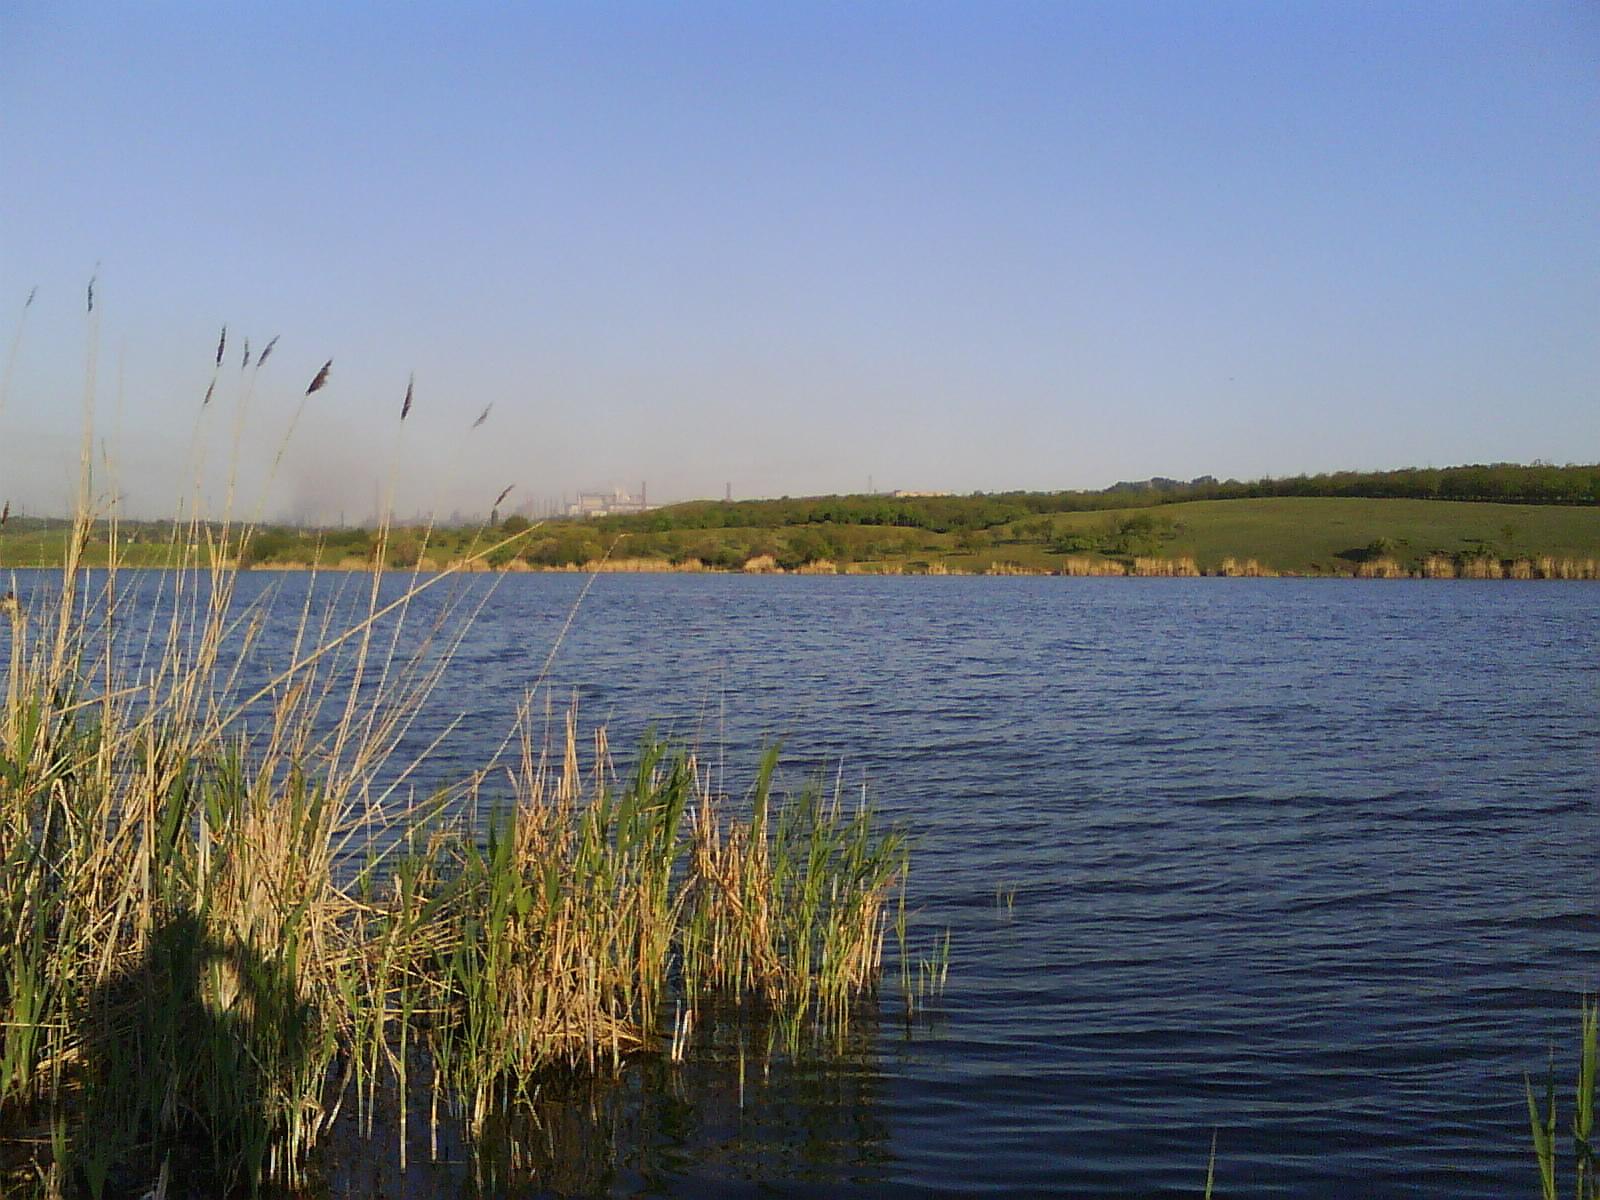 рыбалка в апреле на прудах видео